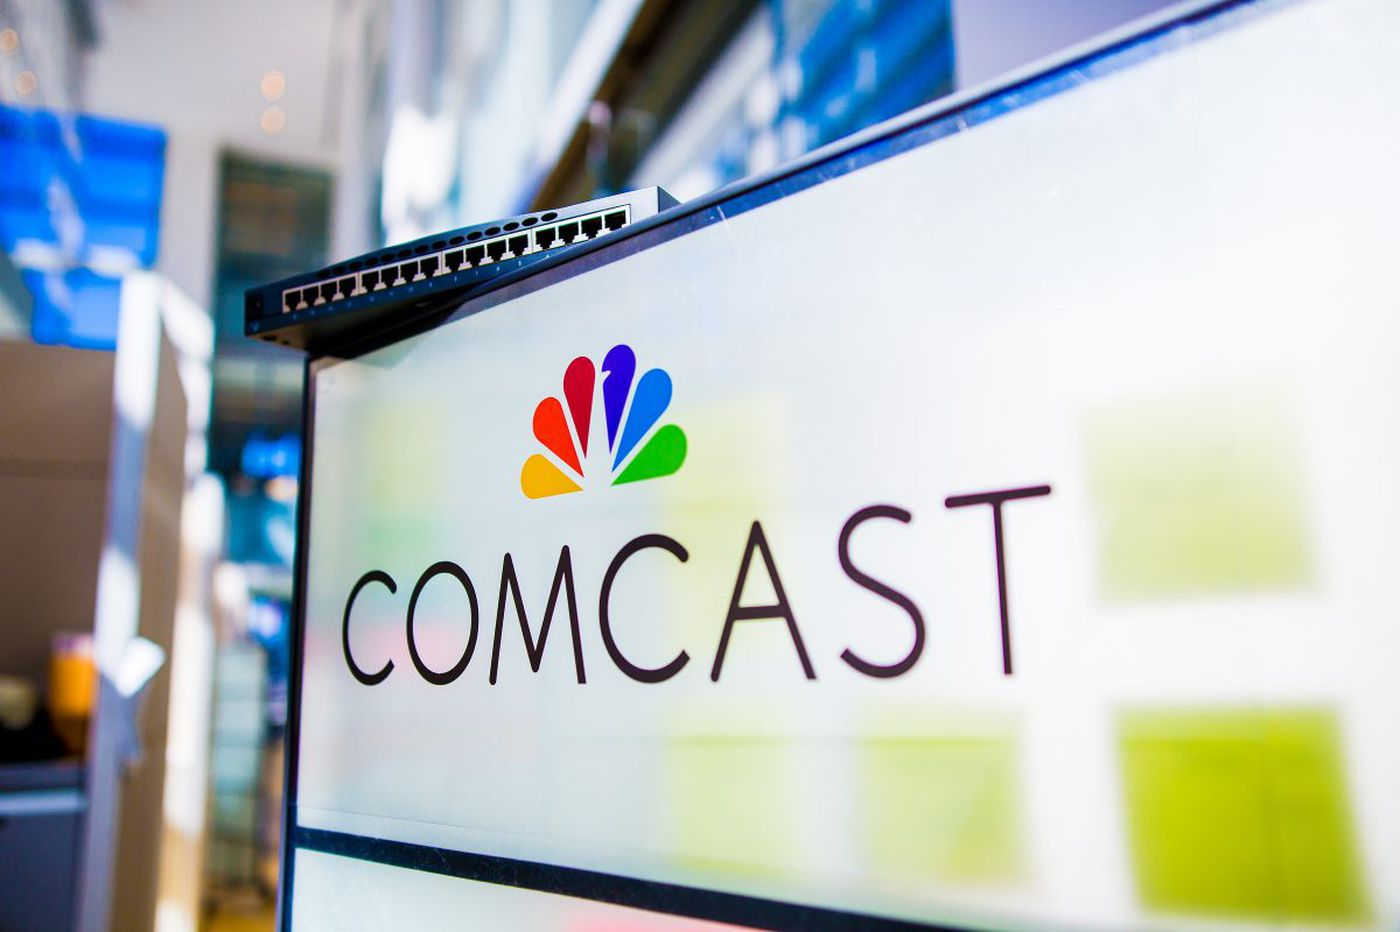 Comcast revenues climb on strong theme parks, films